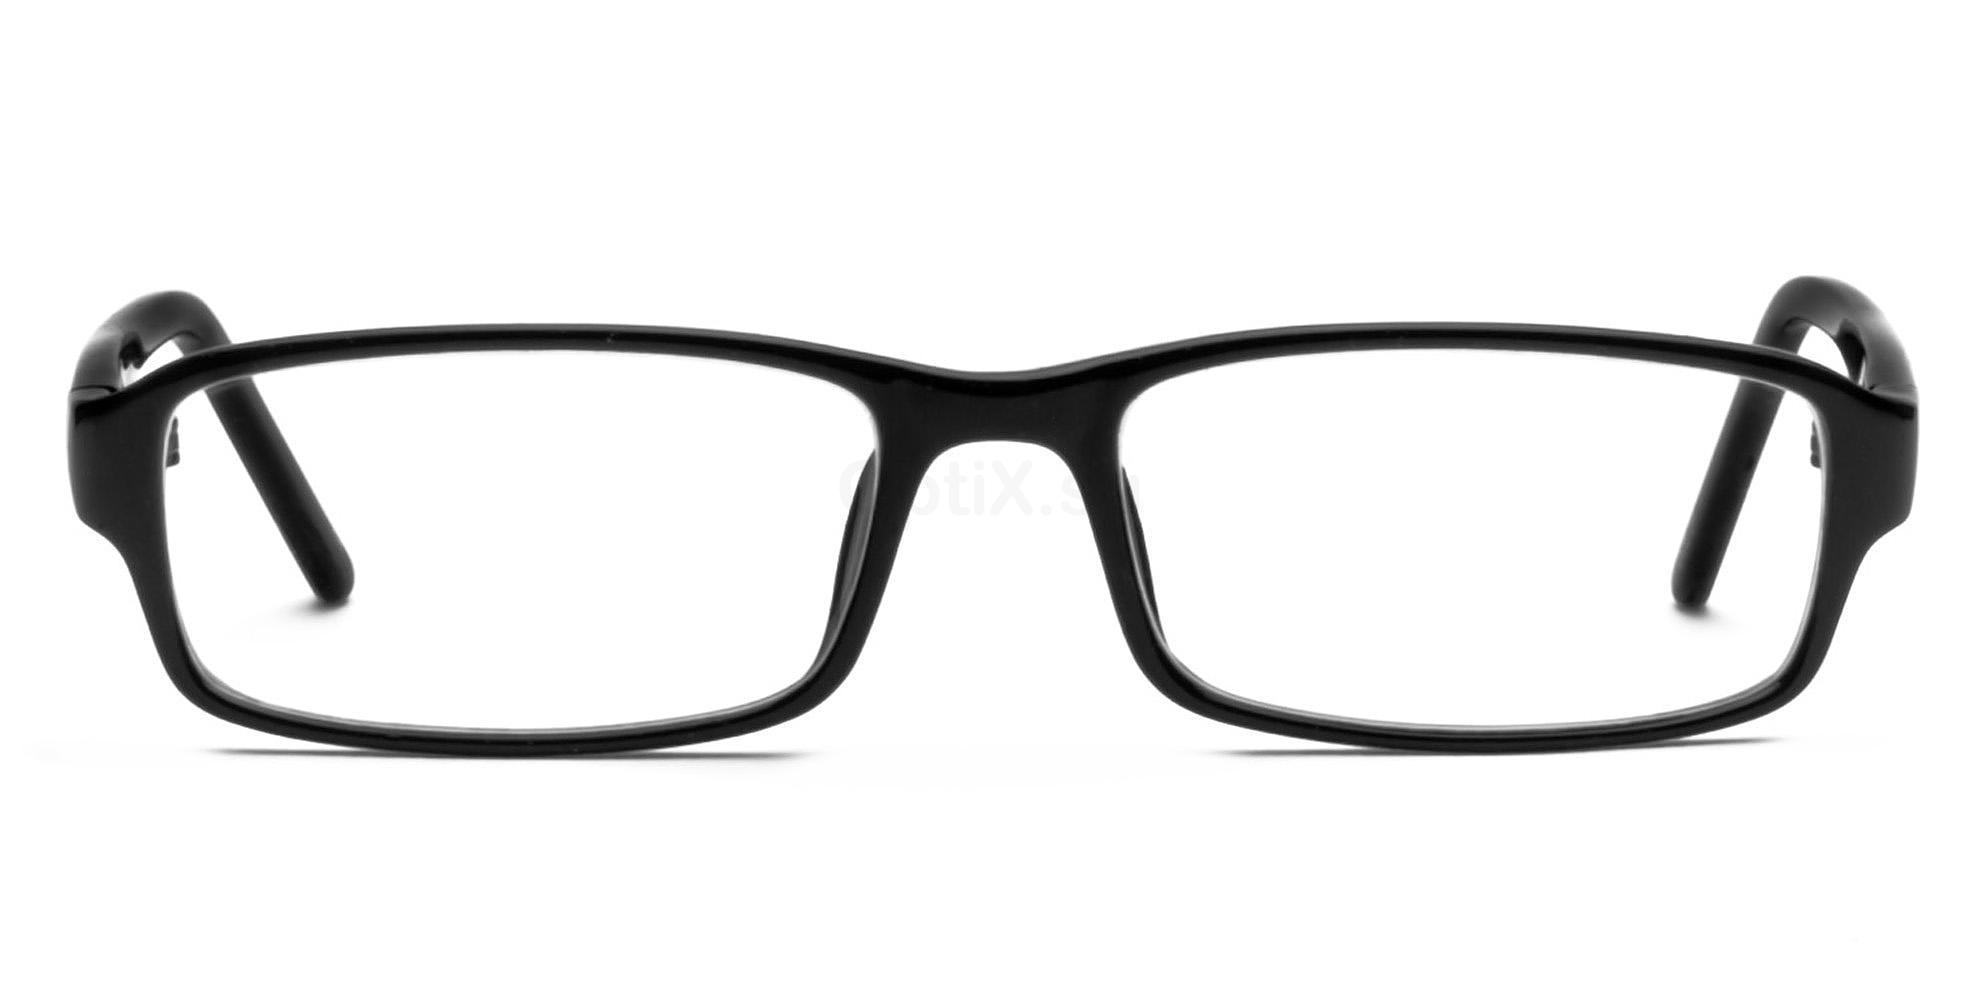 COL 01 2425 Glasses, Infinity